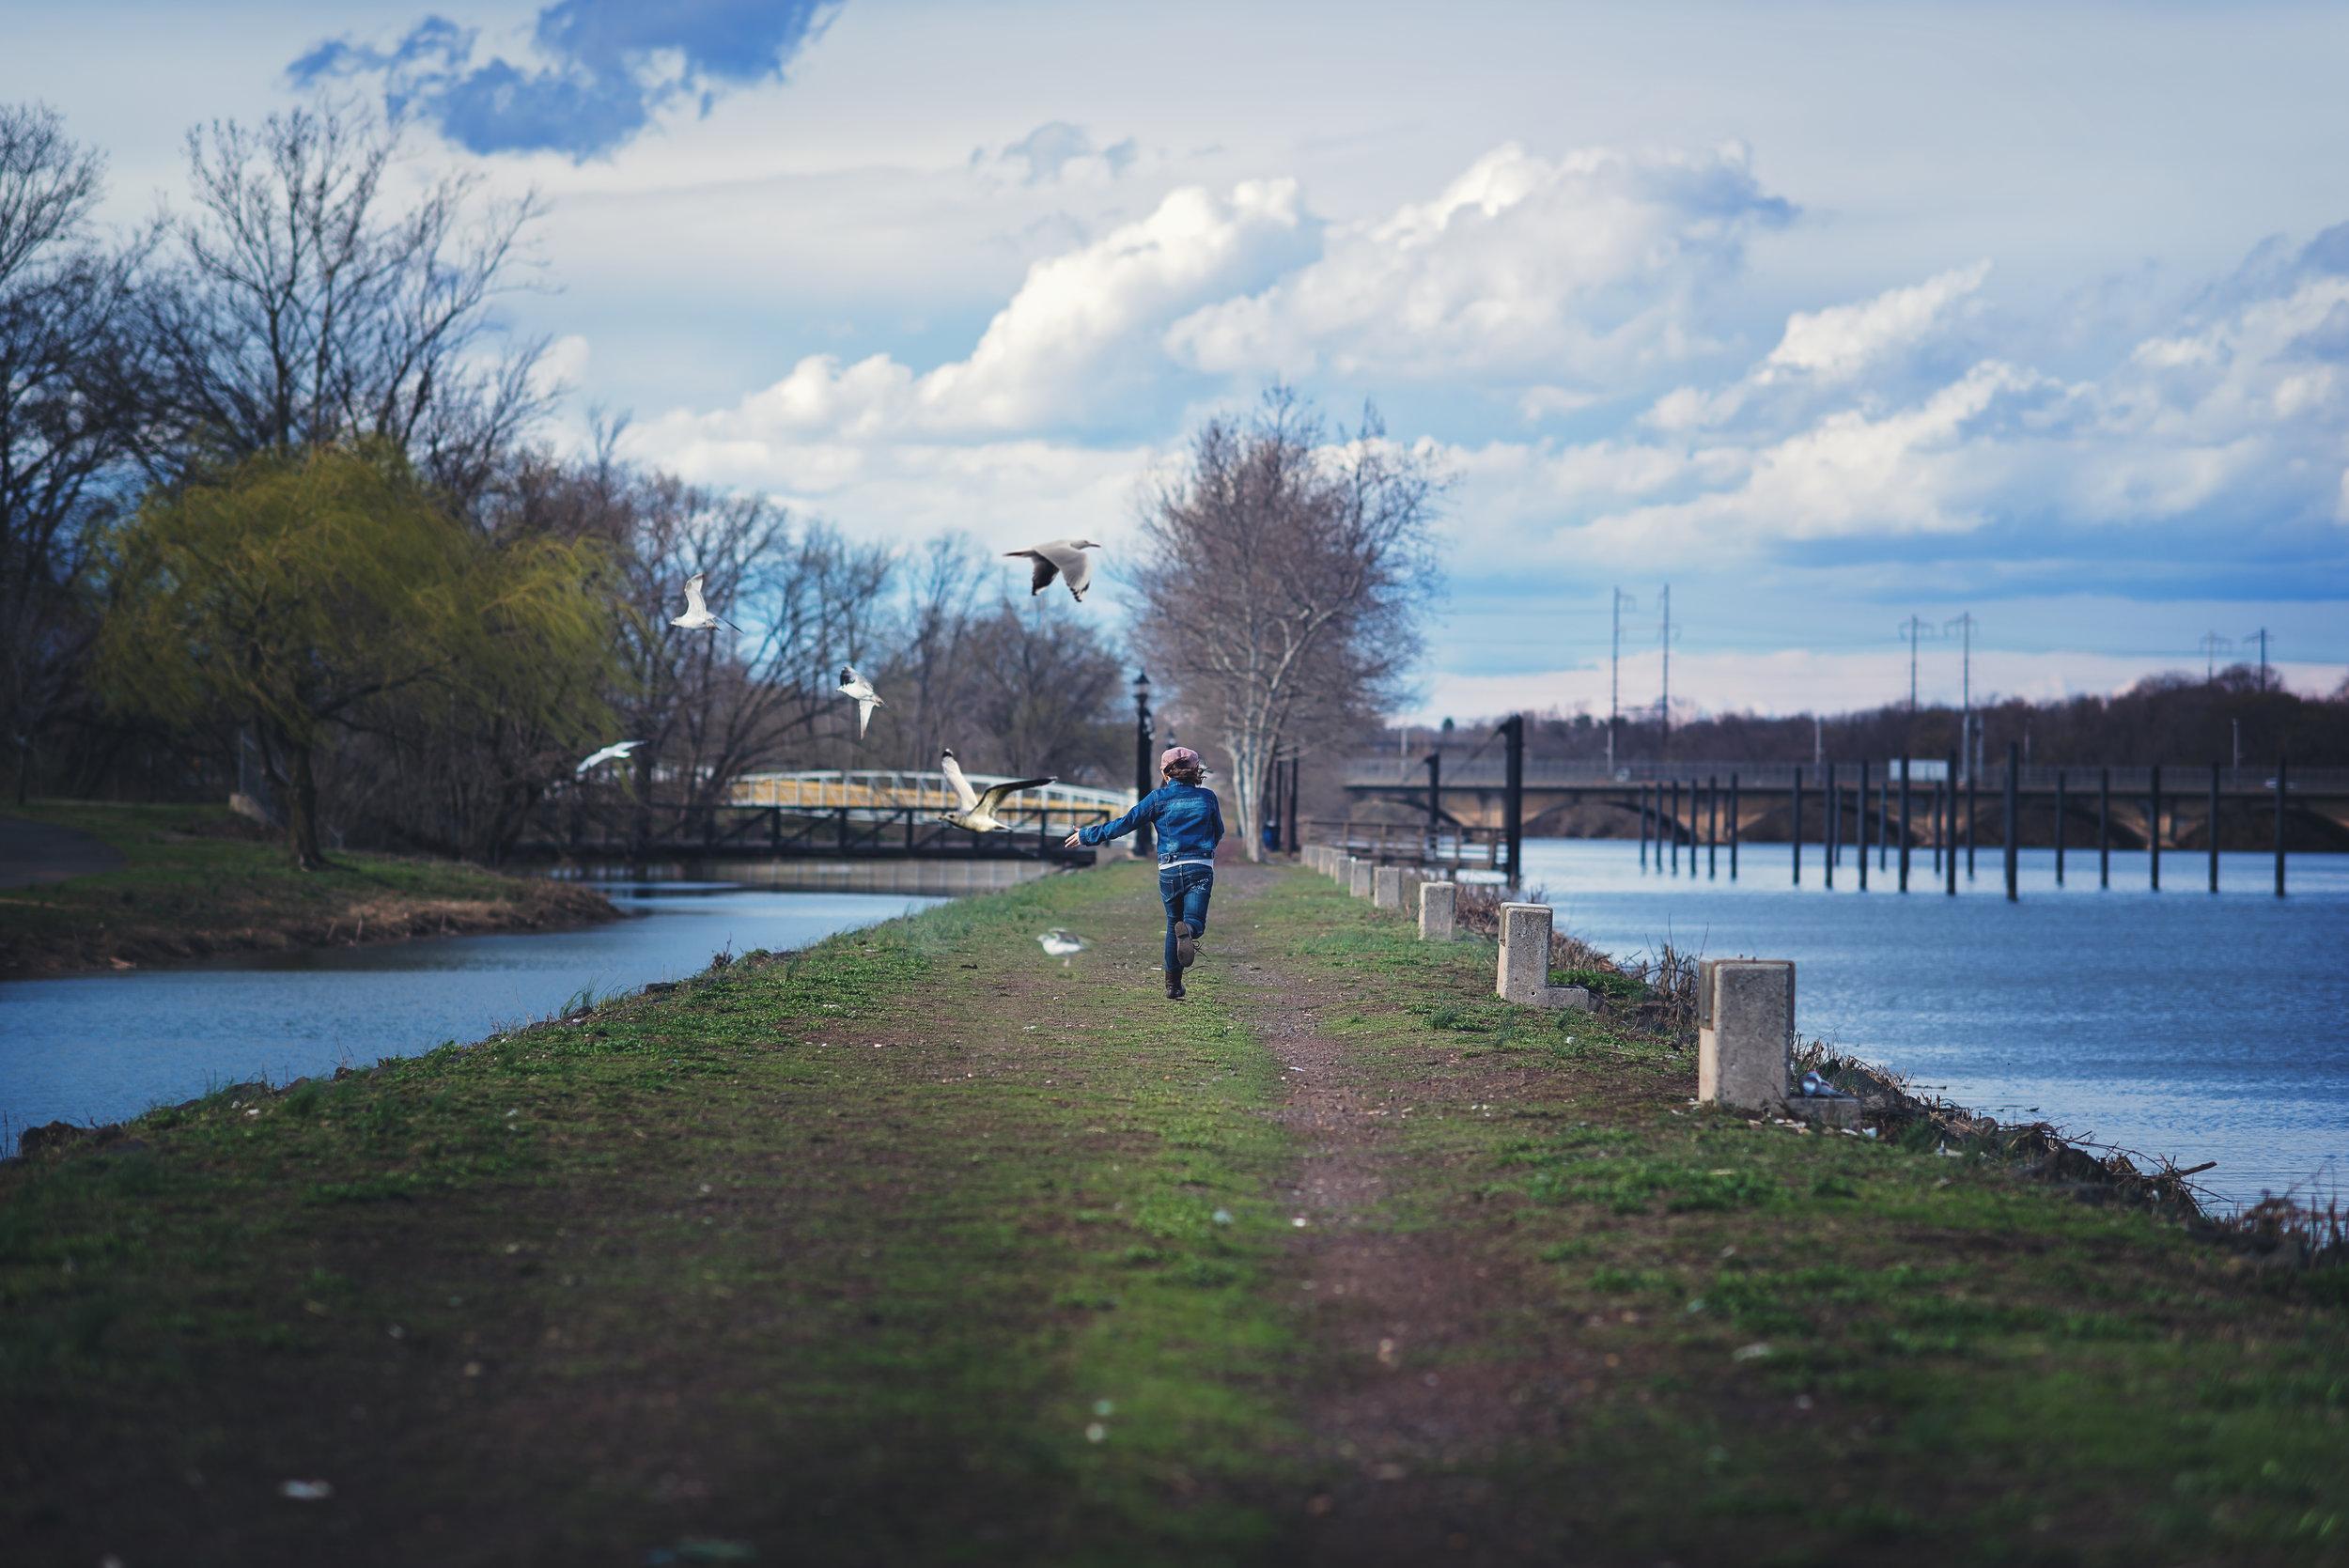 Girls running away with seagulls